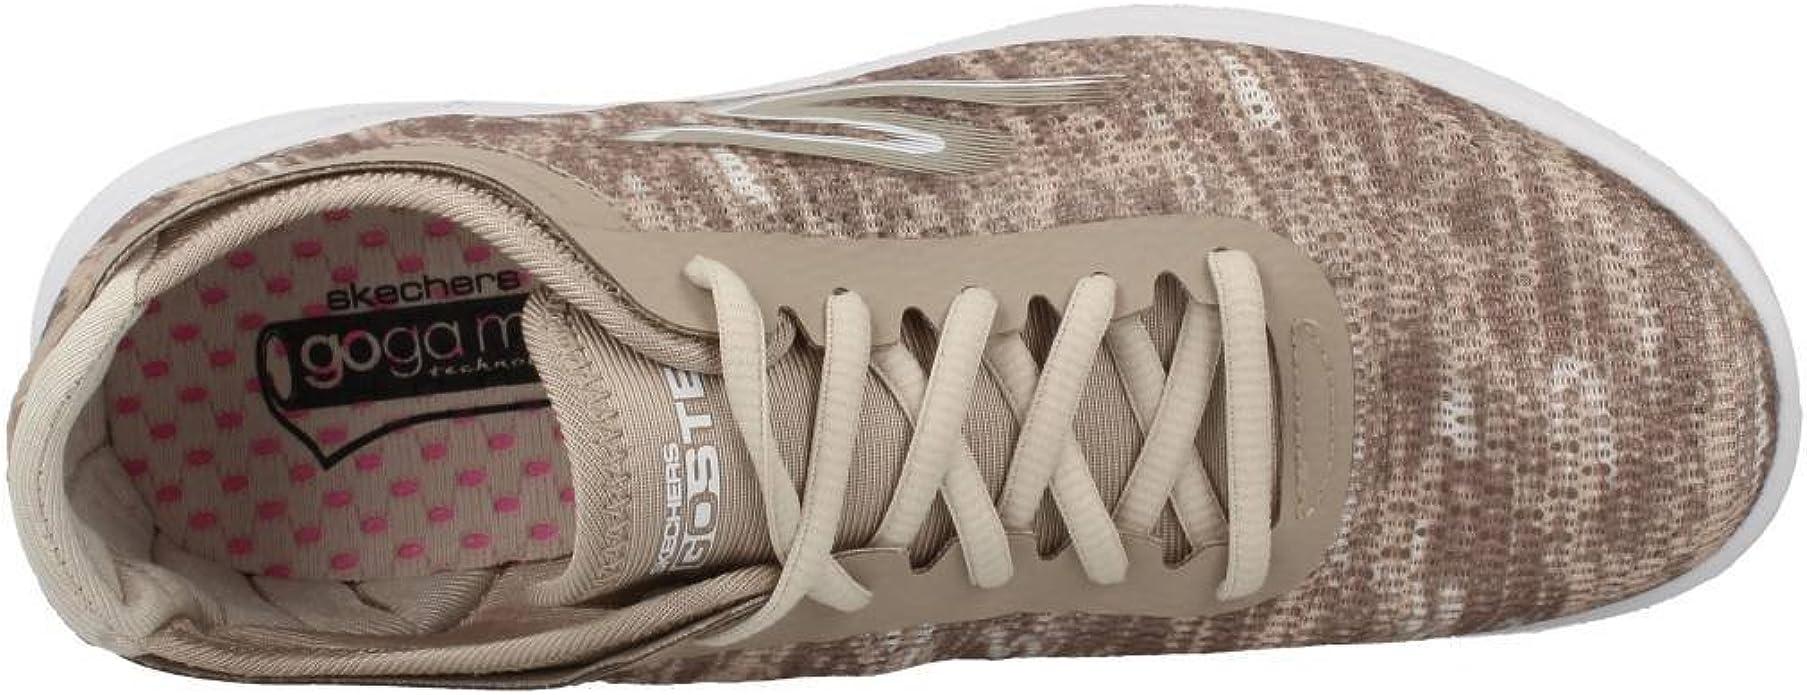 Skechers Go Step Baskets Basses Femme B0798JG7C5